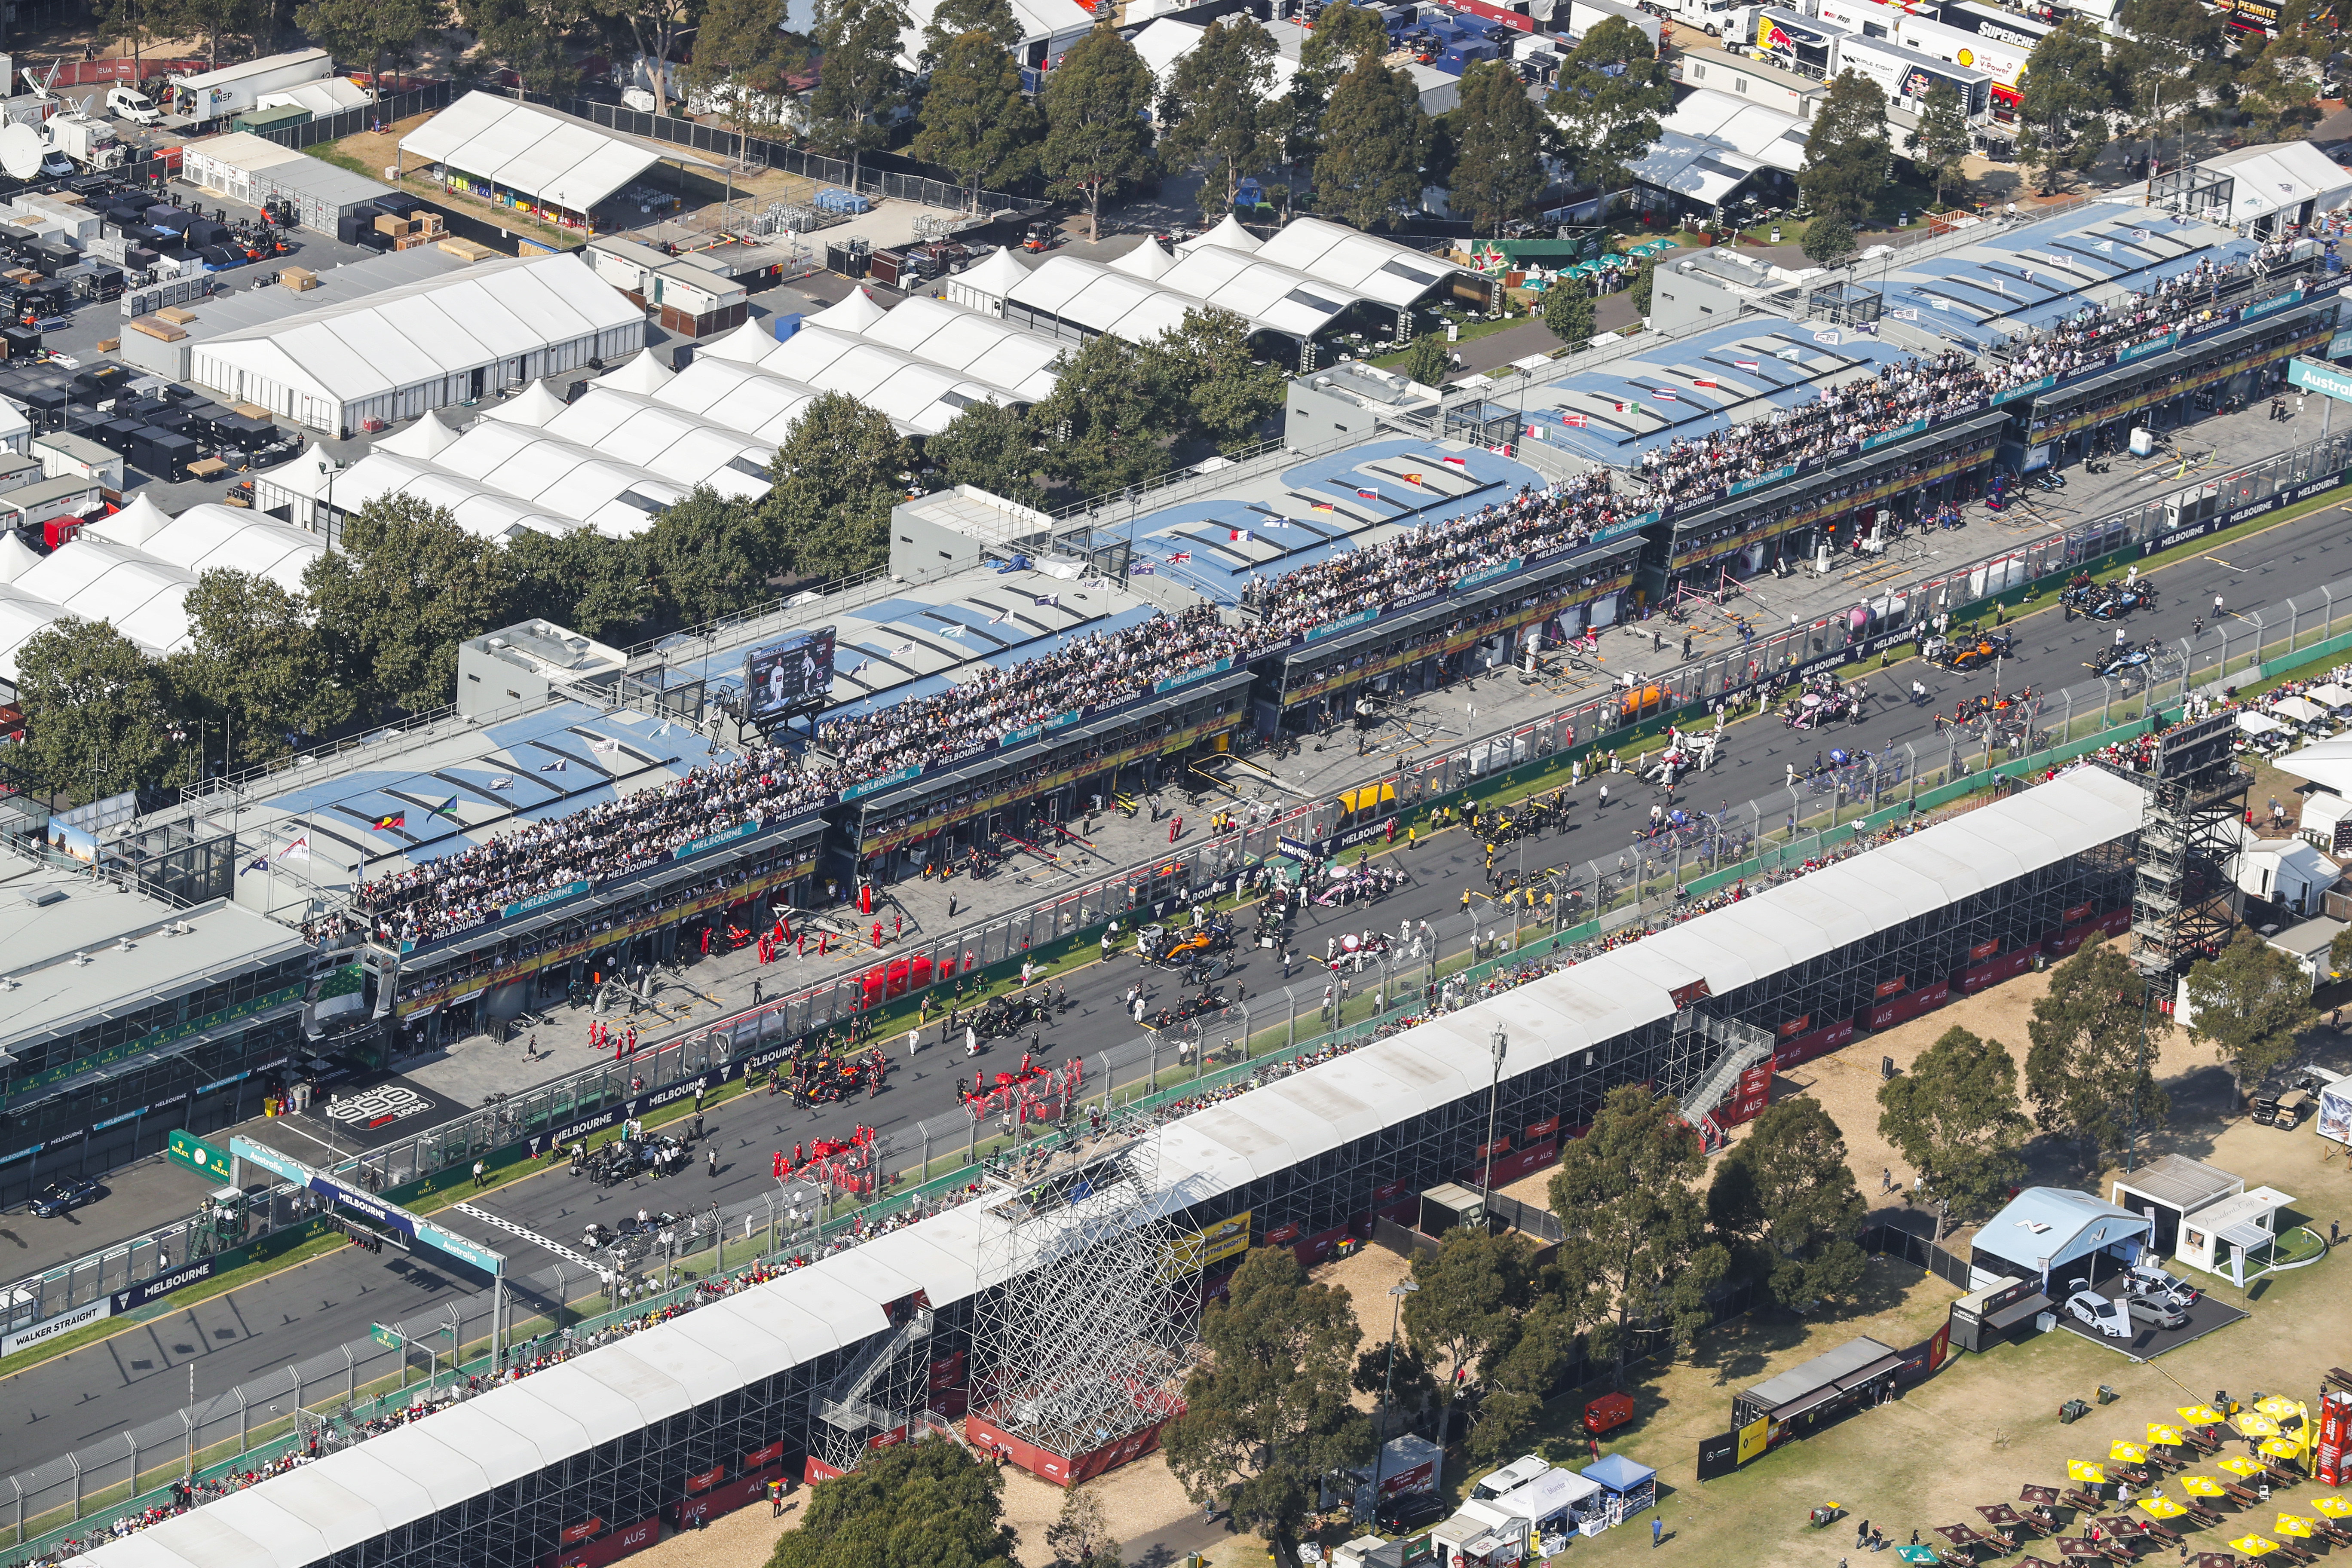 Melbourne confirms 'covid-safe' 2021 season opener